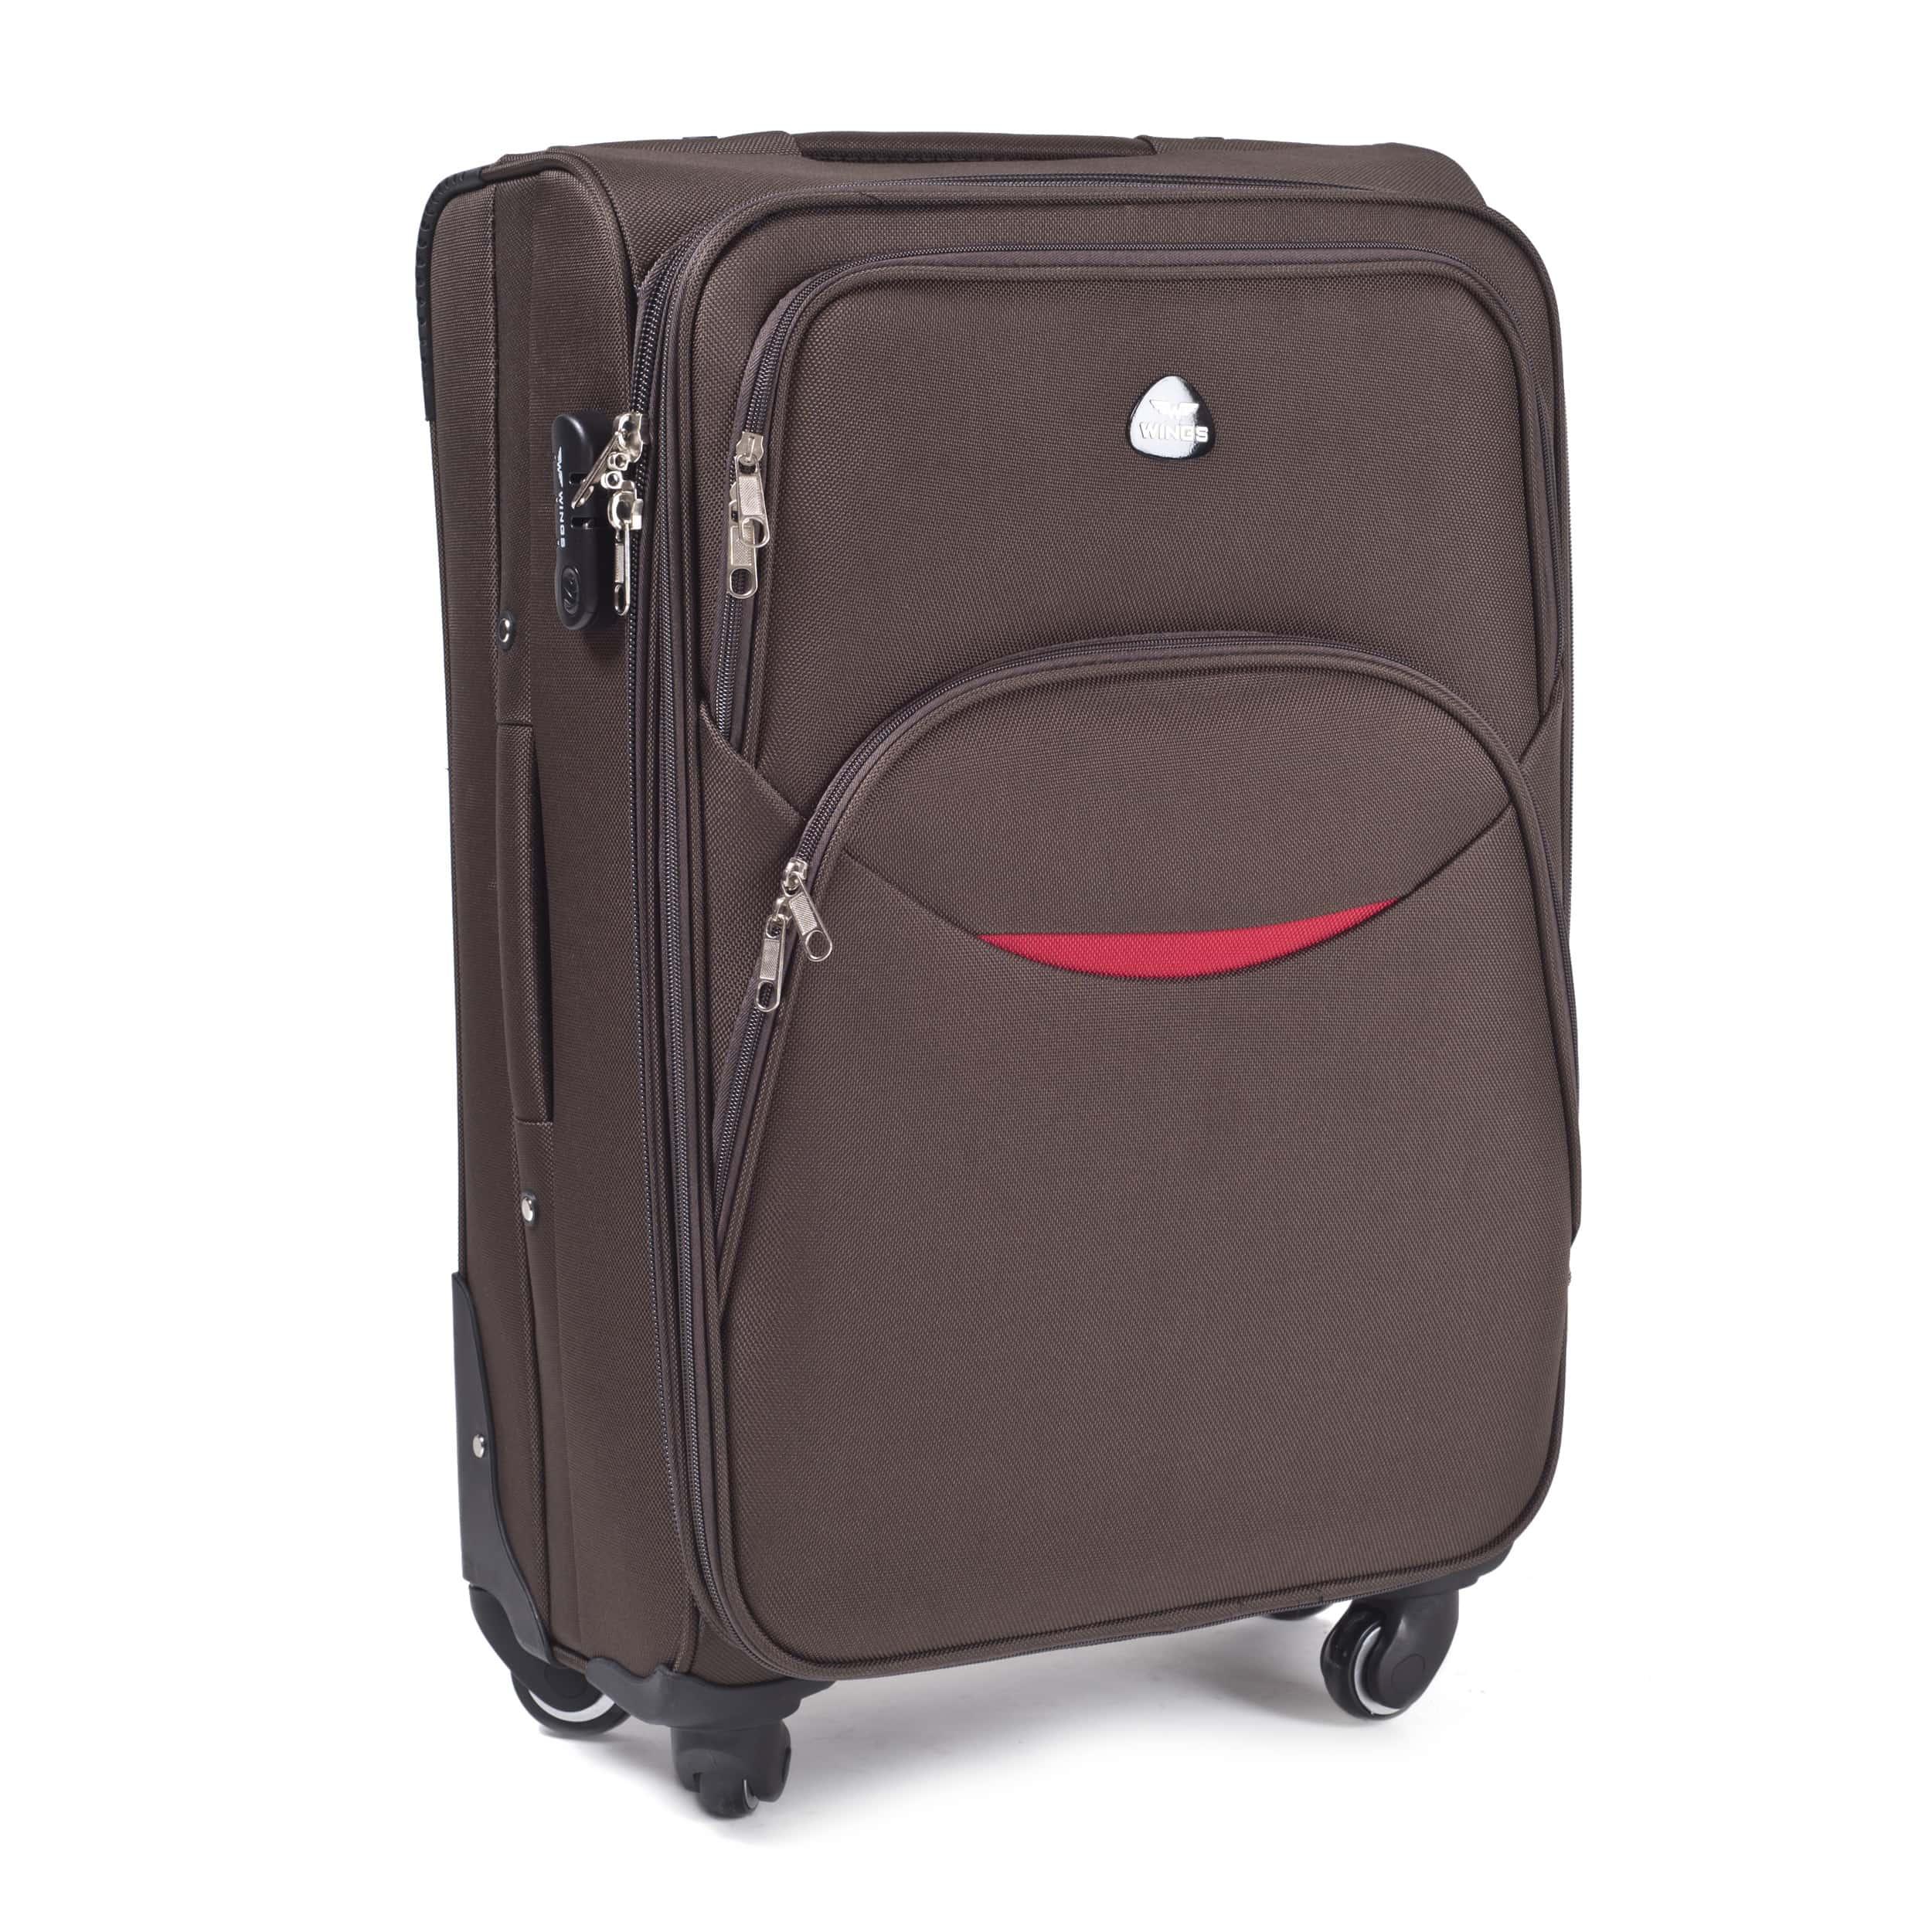 Большой Тканевый Чемодан Wings 1708-4 L D.Coffe PREMIUM на 4-х прочных колесах! Для багажа,до 23 кг